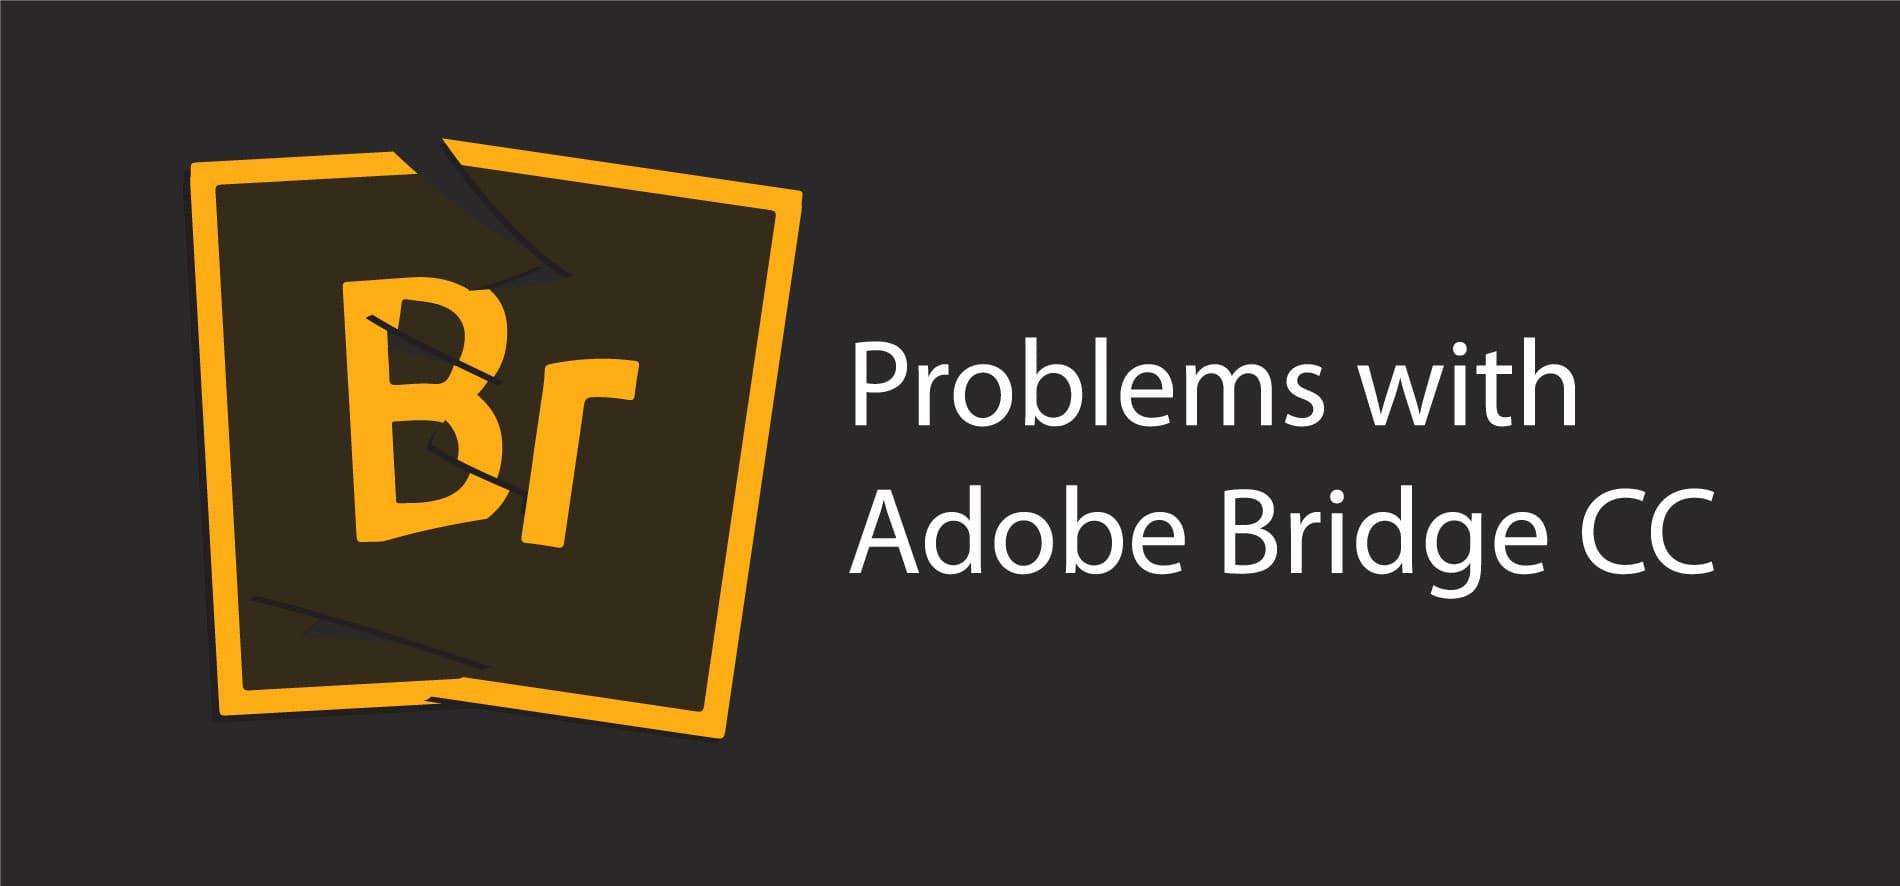 Having problems with Adobe Bridge CC Cache?